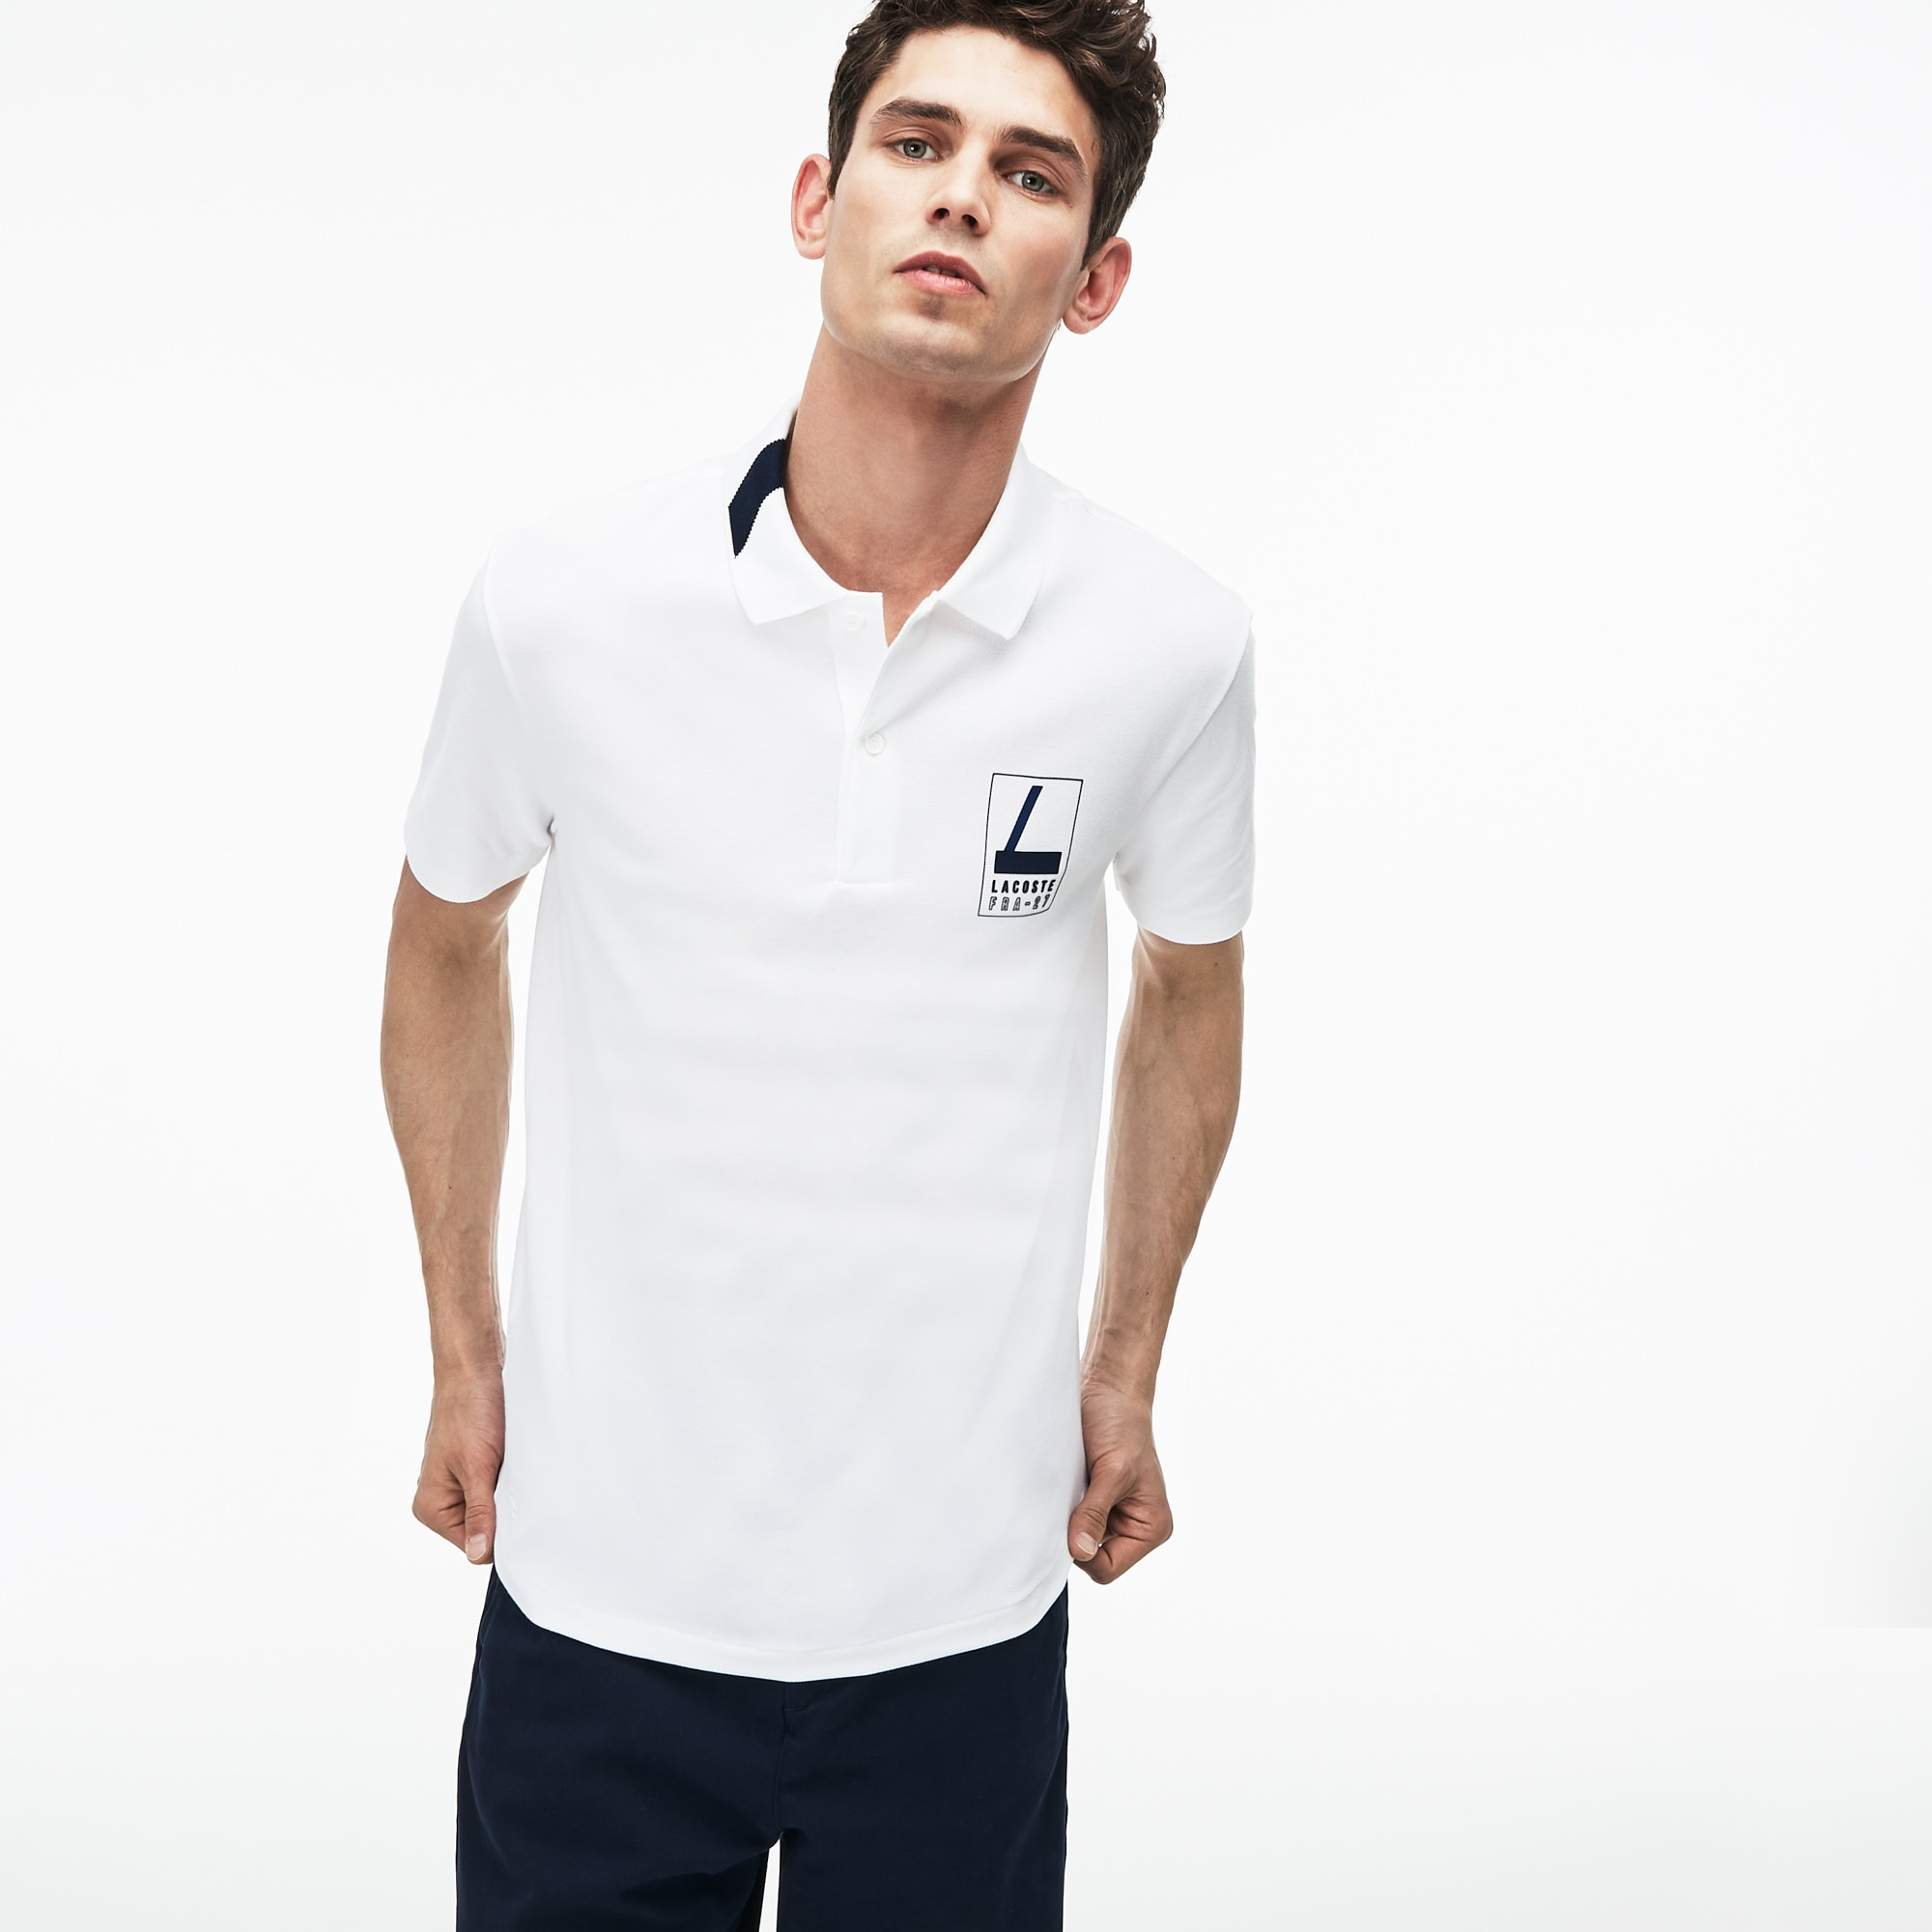 dd80c39fa4 Men's Lacoste Slim Fit Lettering Stretch Mini Piqué Polo Shirt